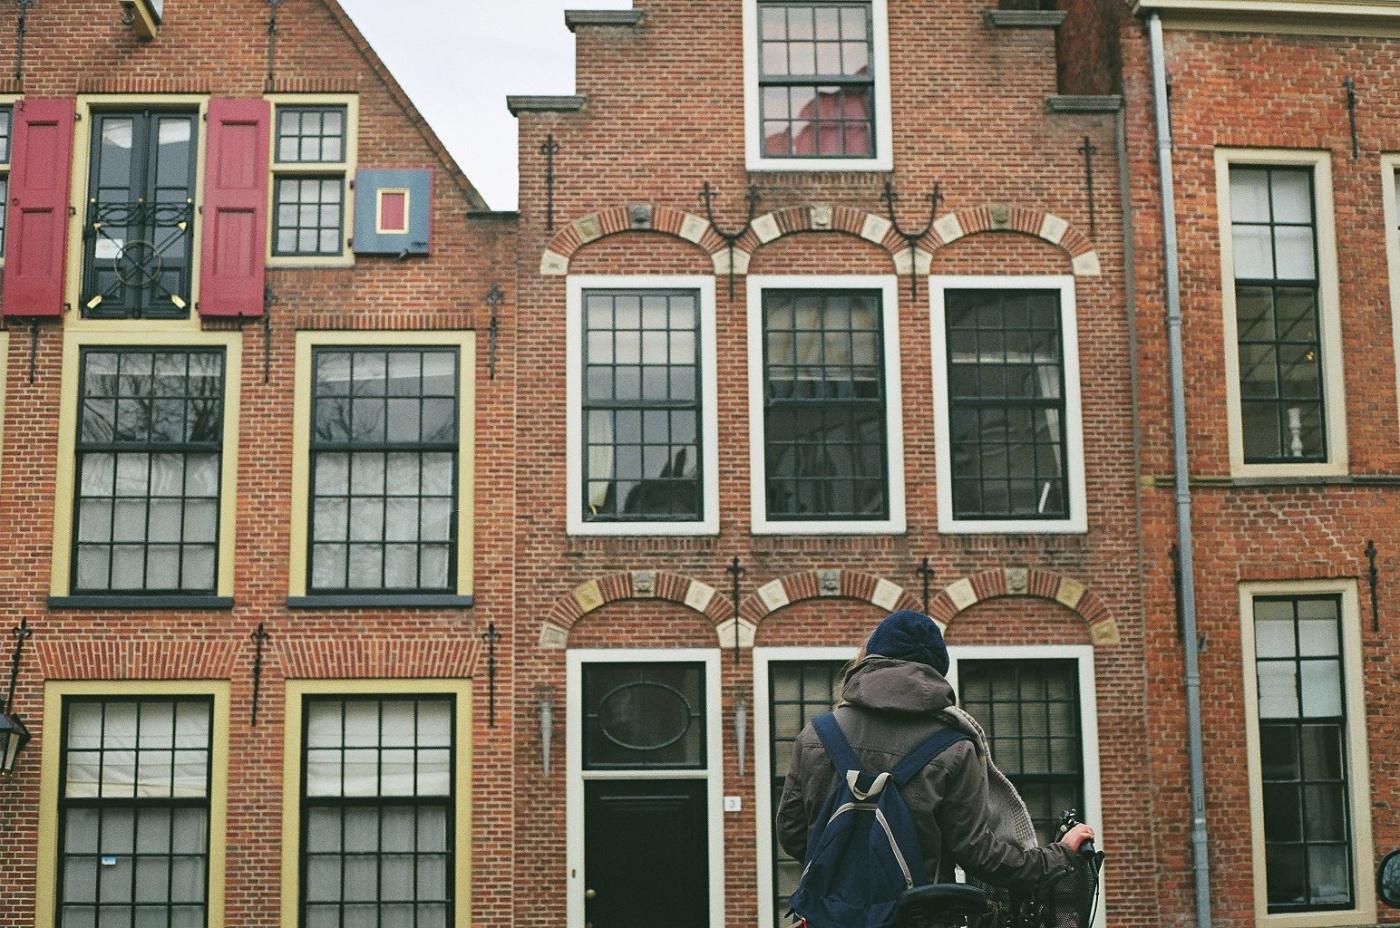 Sint Walburgstraat gatvės pastatai